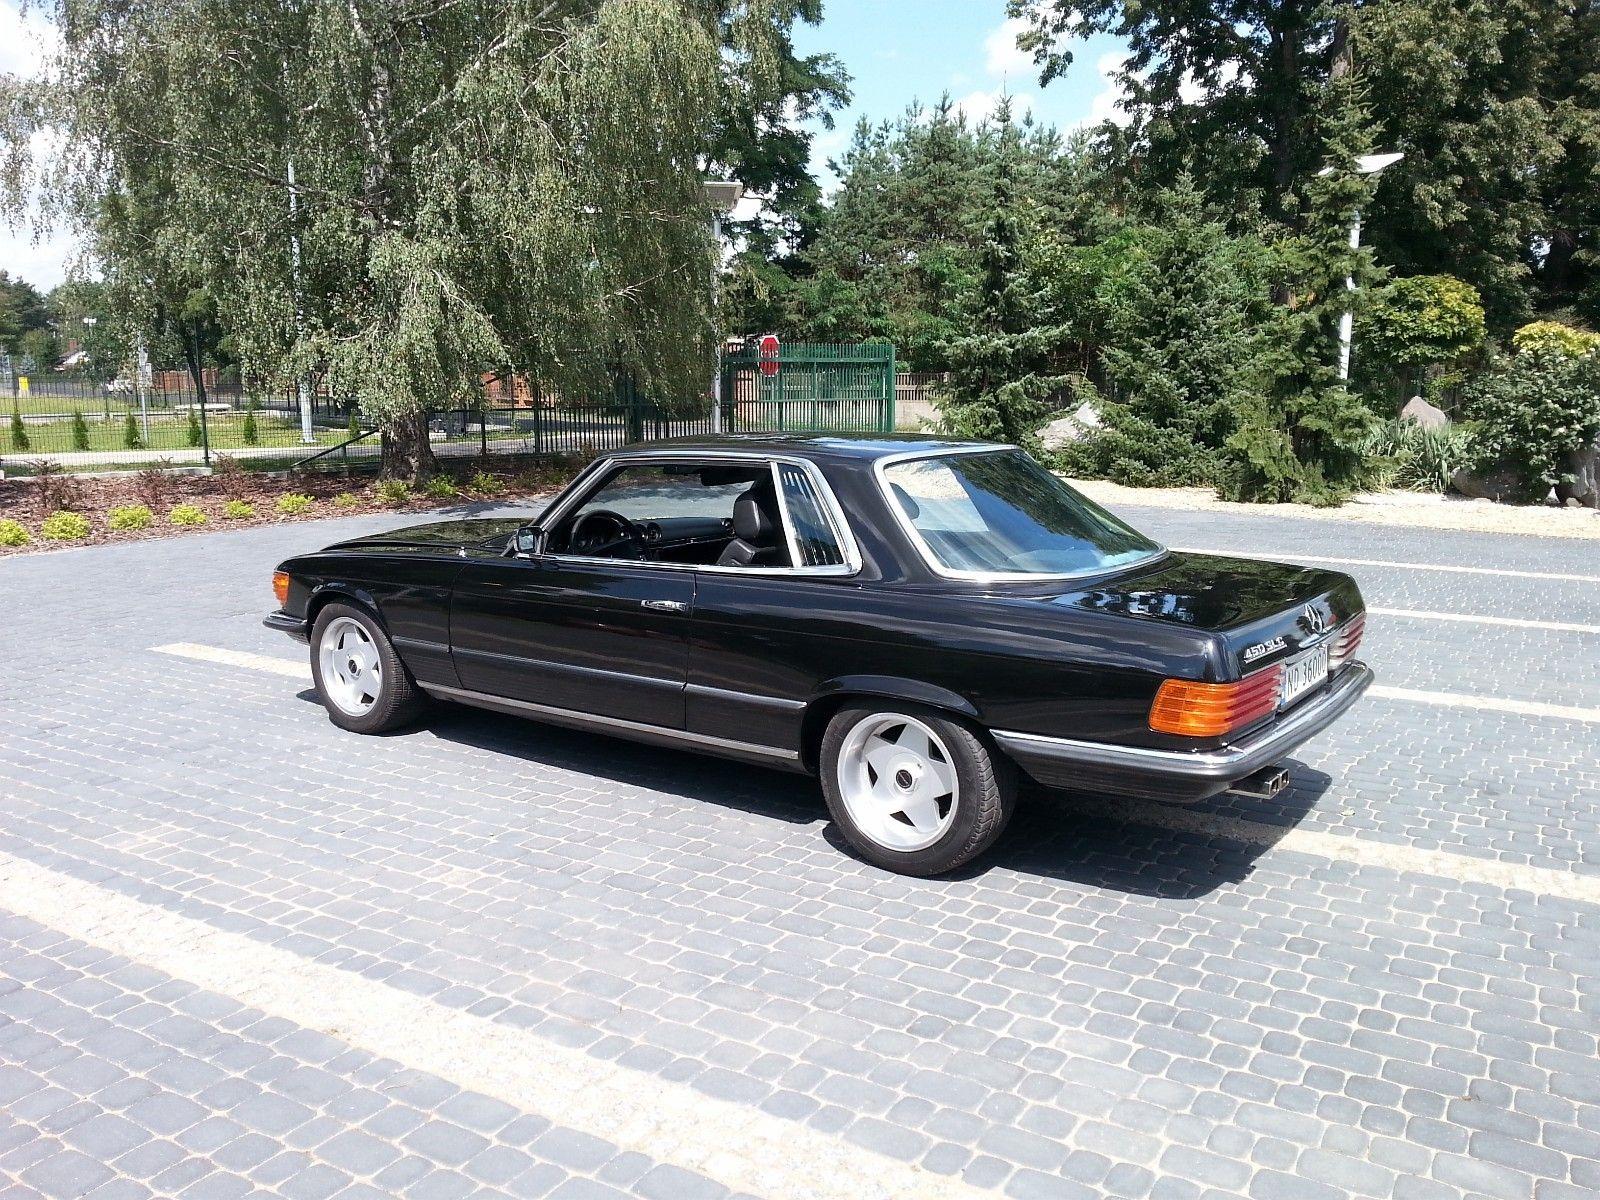 Mercedes benz slc 450 sl coupe str ken 1973 164 000 km kr 138